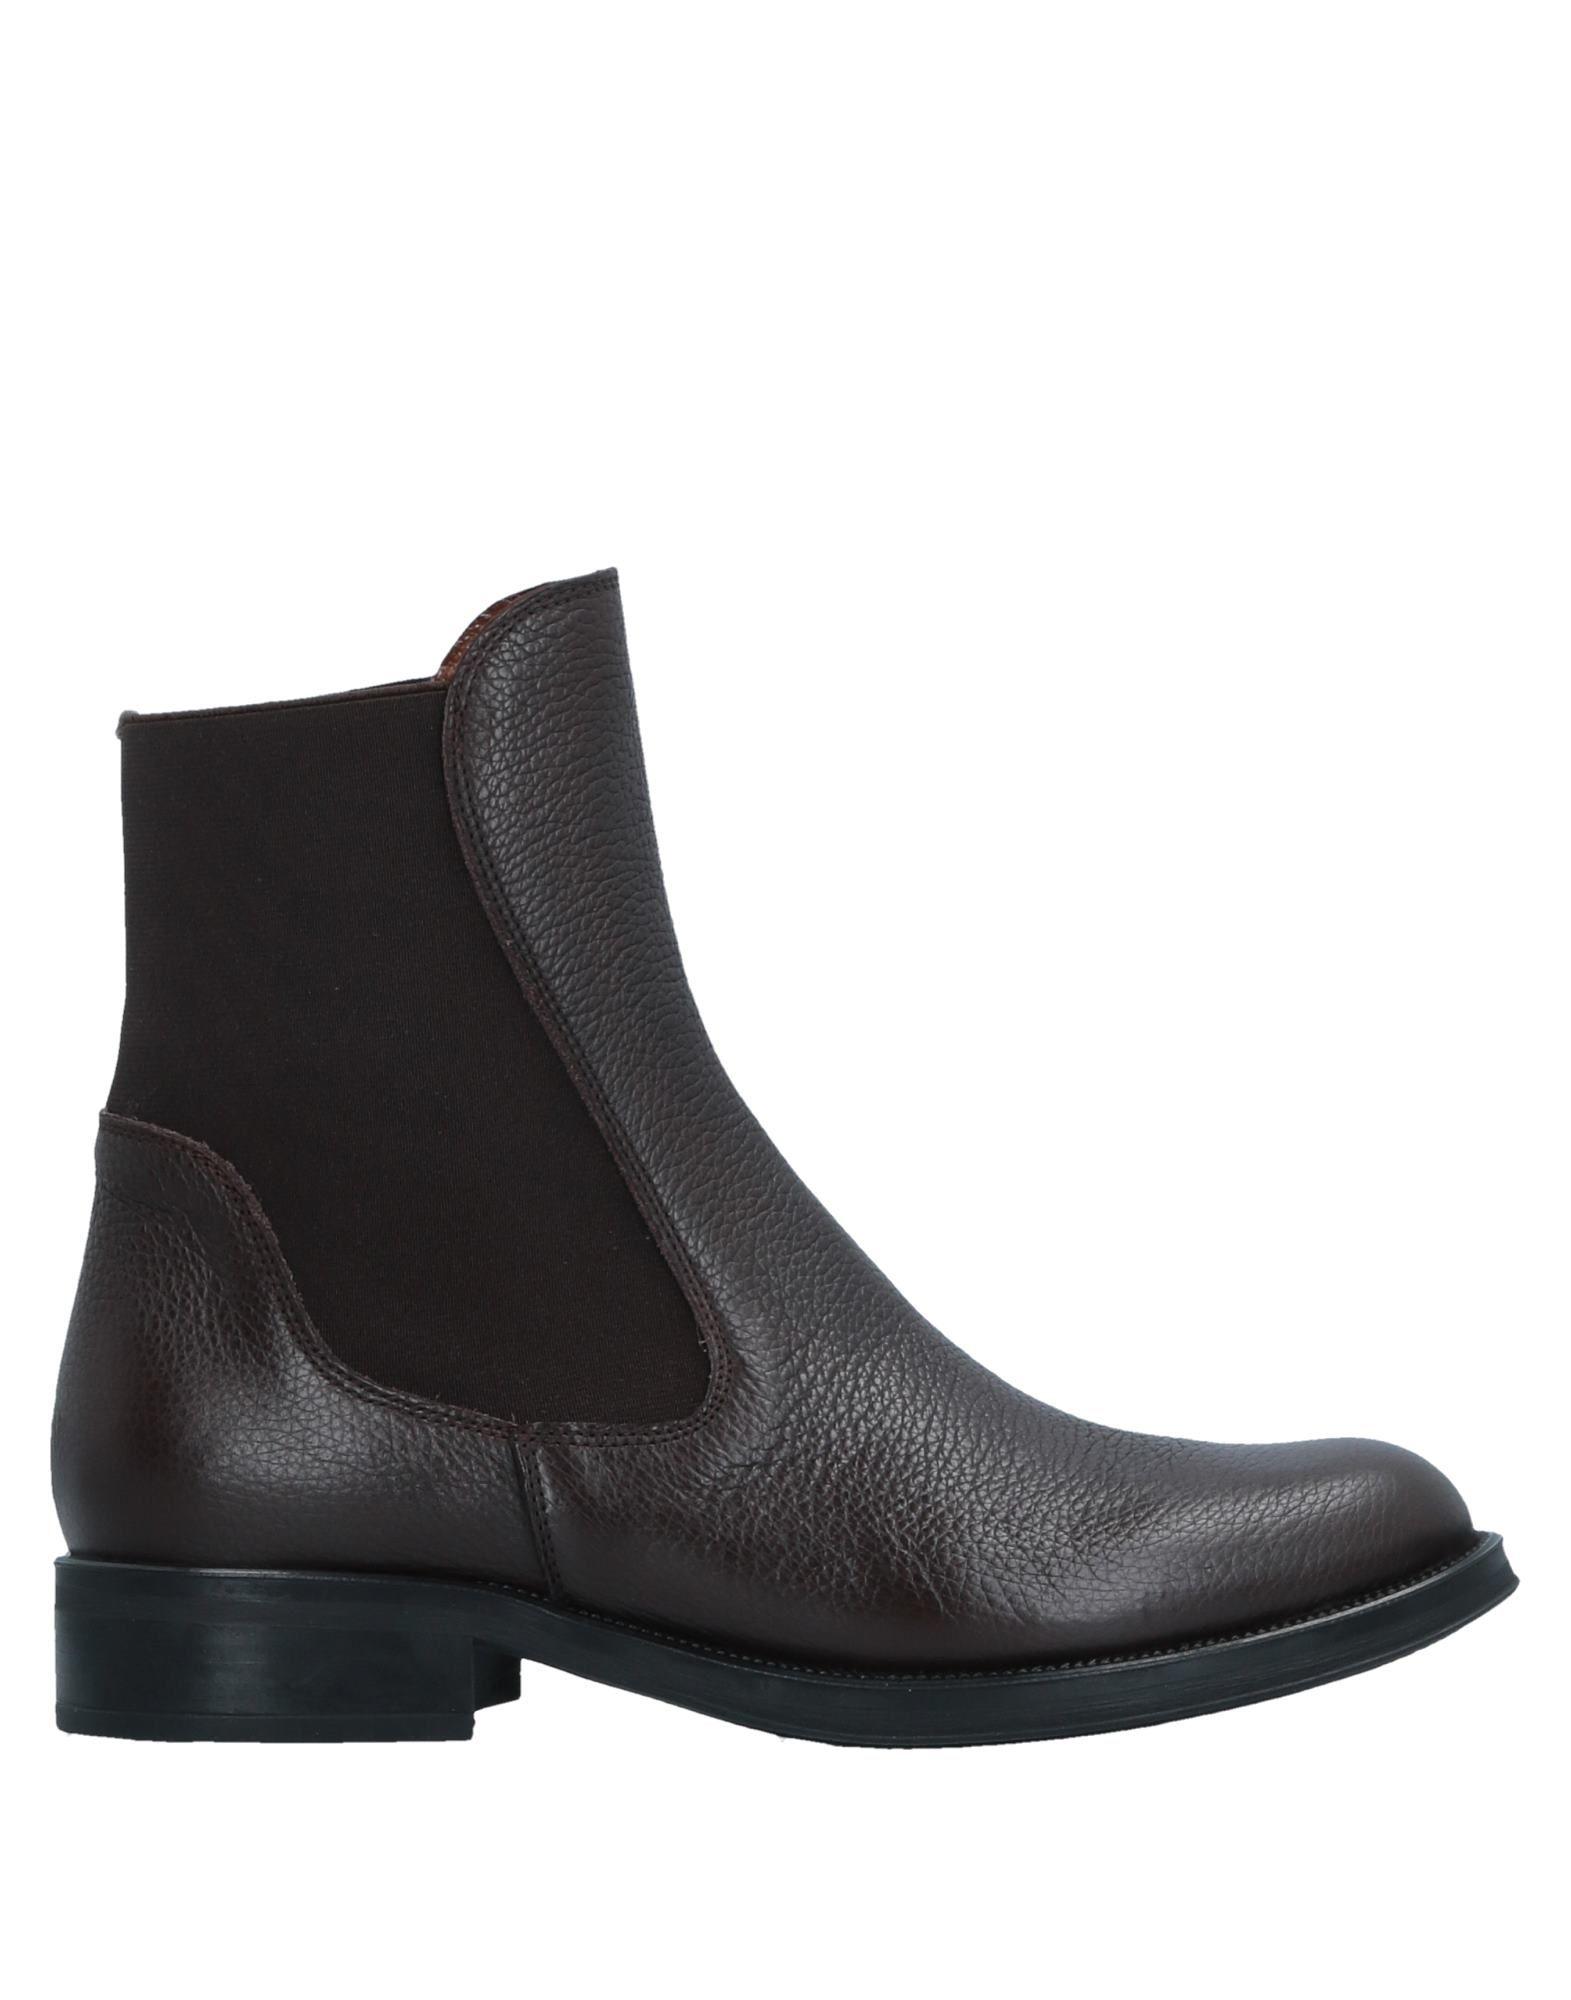 Rabatt Schuhe F.Lli Bruglia Stiefelette Damen  11518004KV